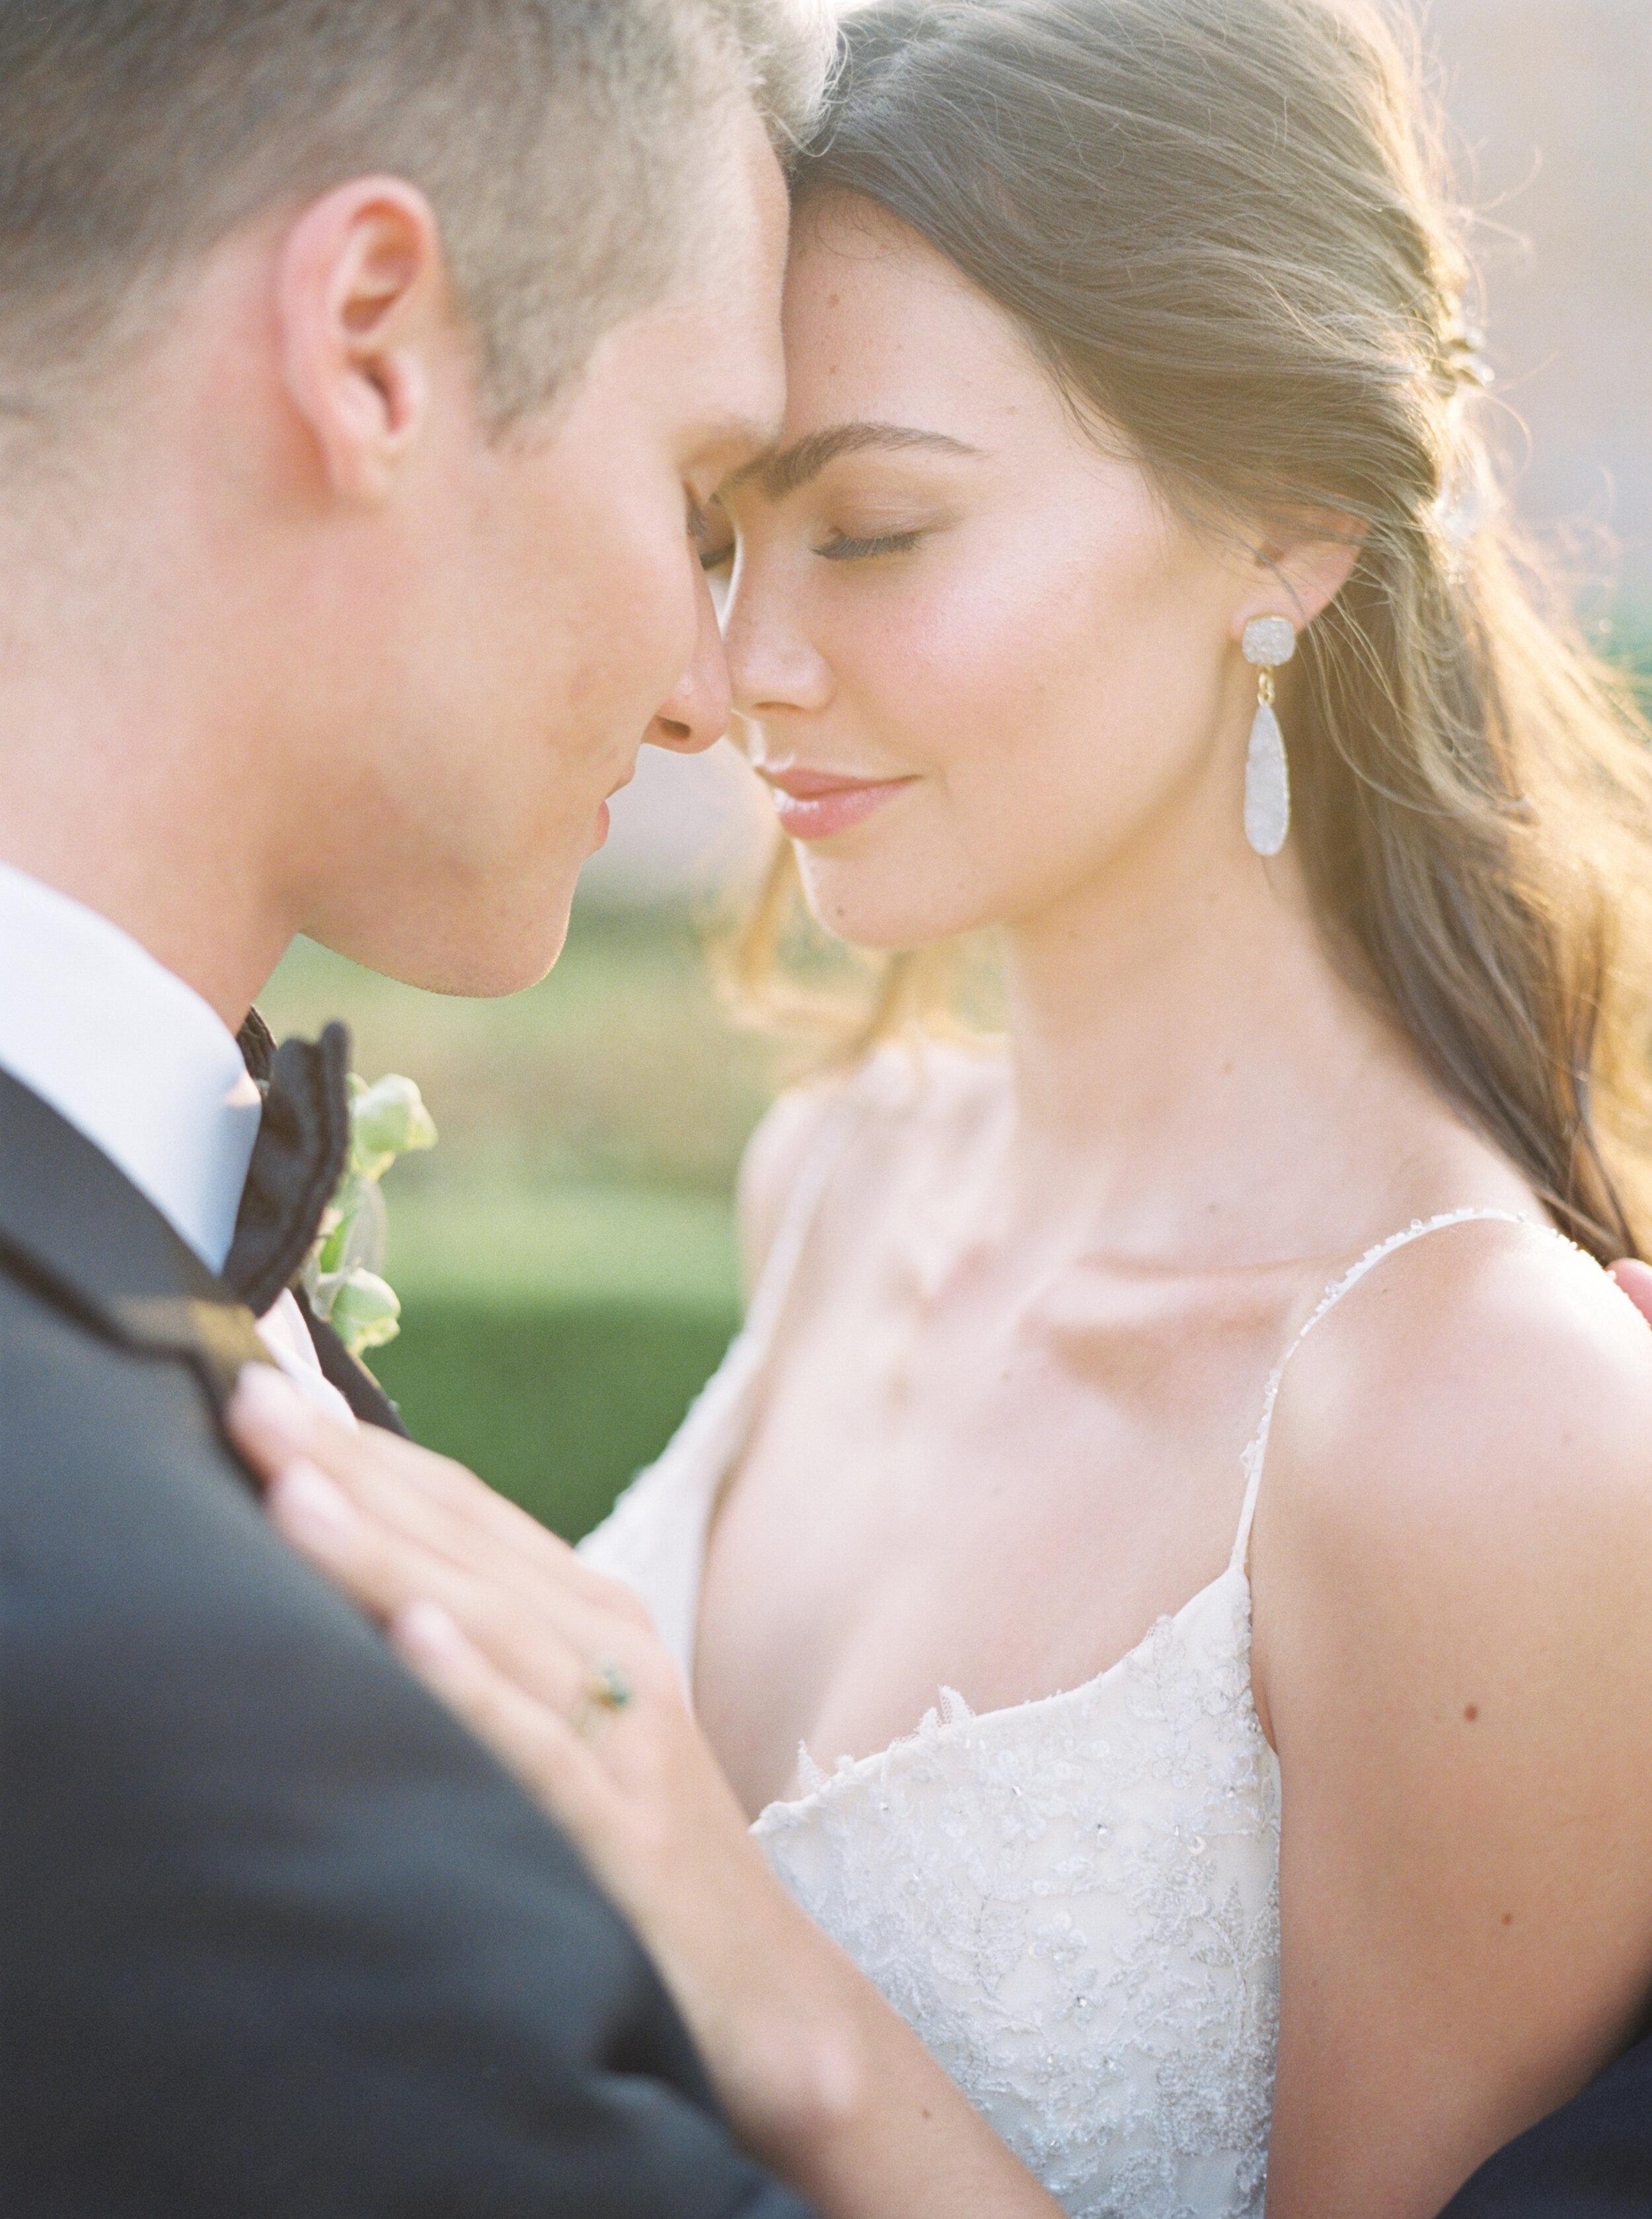 Bibb_Mill_Wedding_Editorial_Columbus_Georgia_Fallen_Photography_6-54.JPG